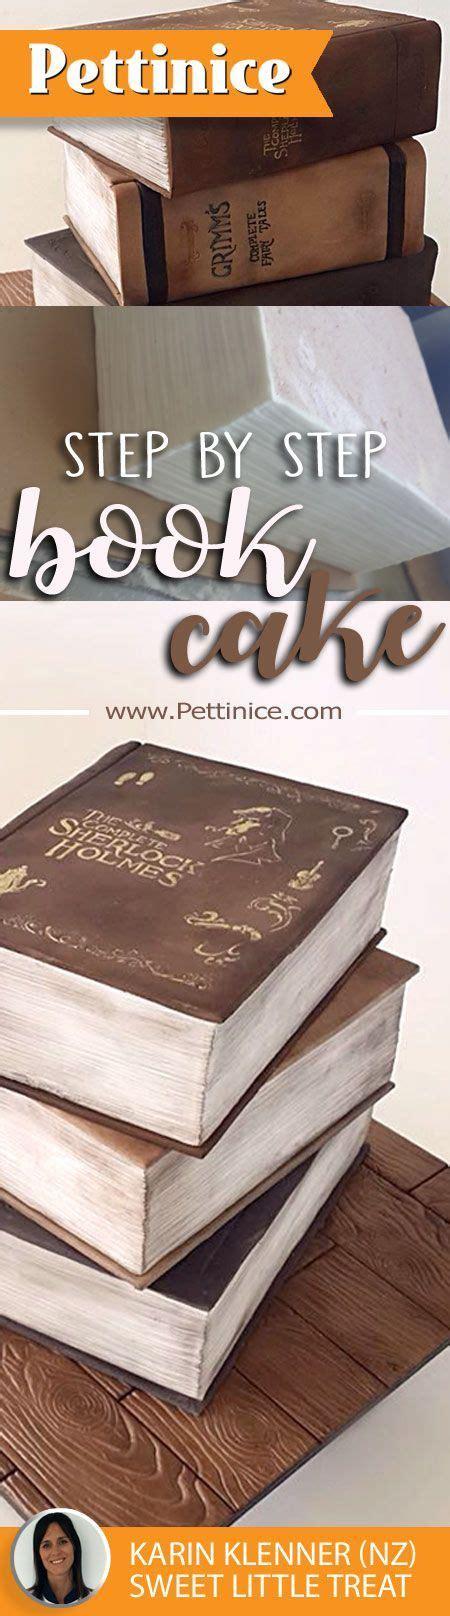 book stacking ideas best 20 book cupcakes ideas on pinterest dr seuss